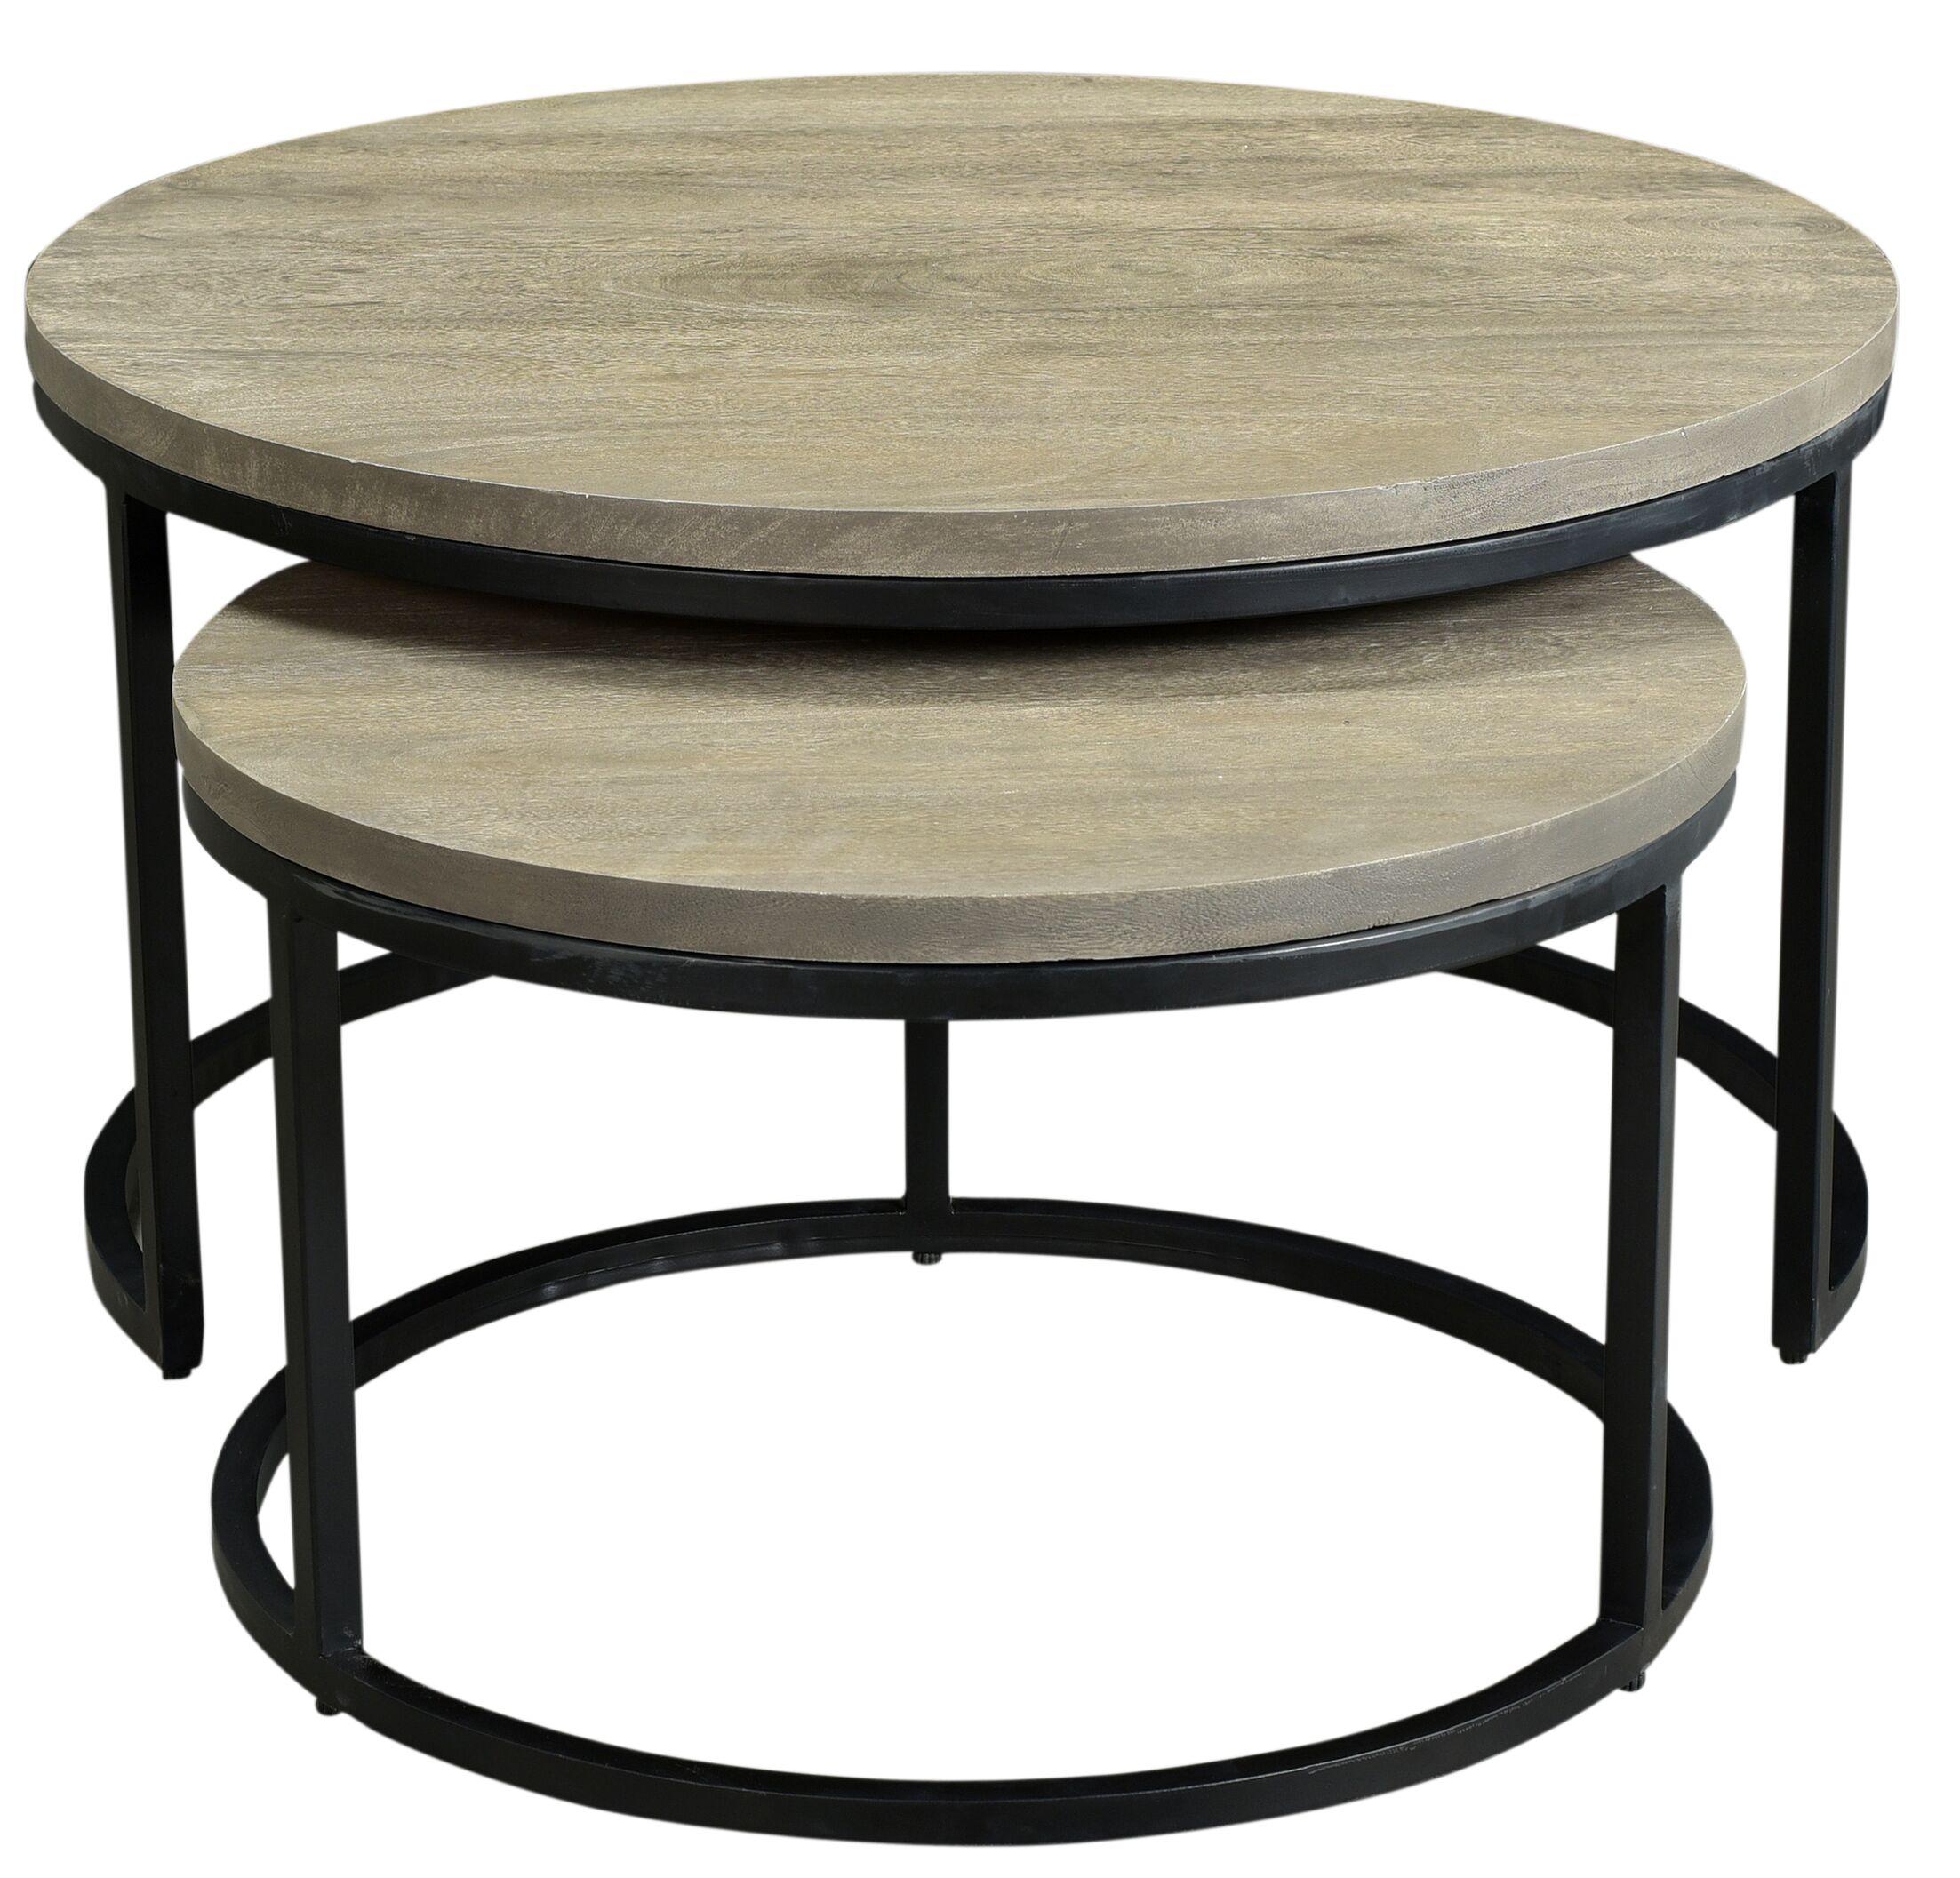 Beland 2 Piece Nesting Tables